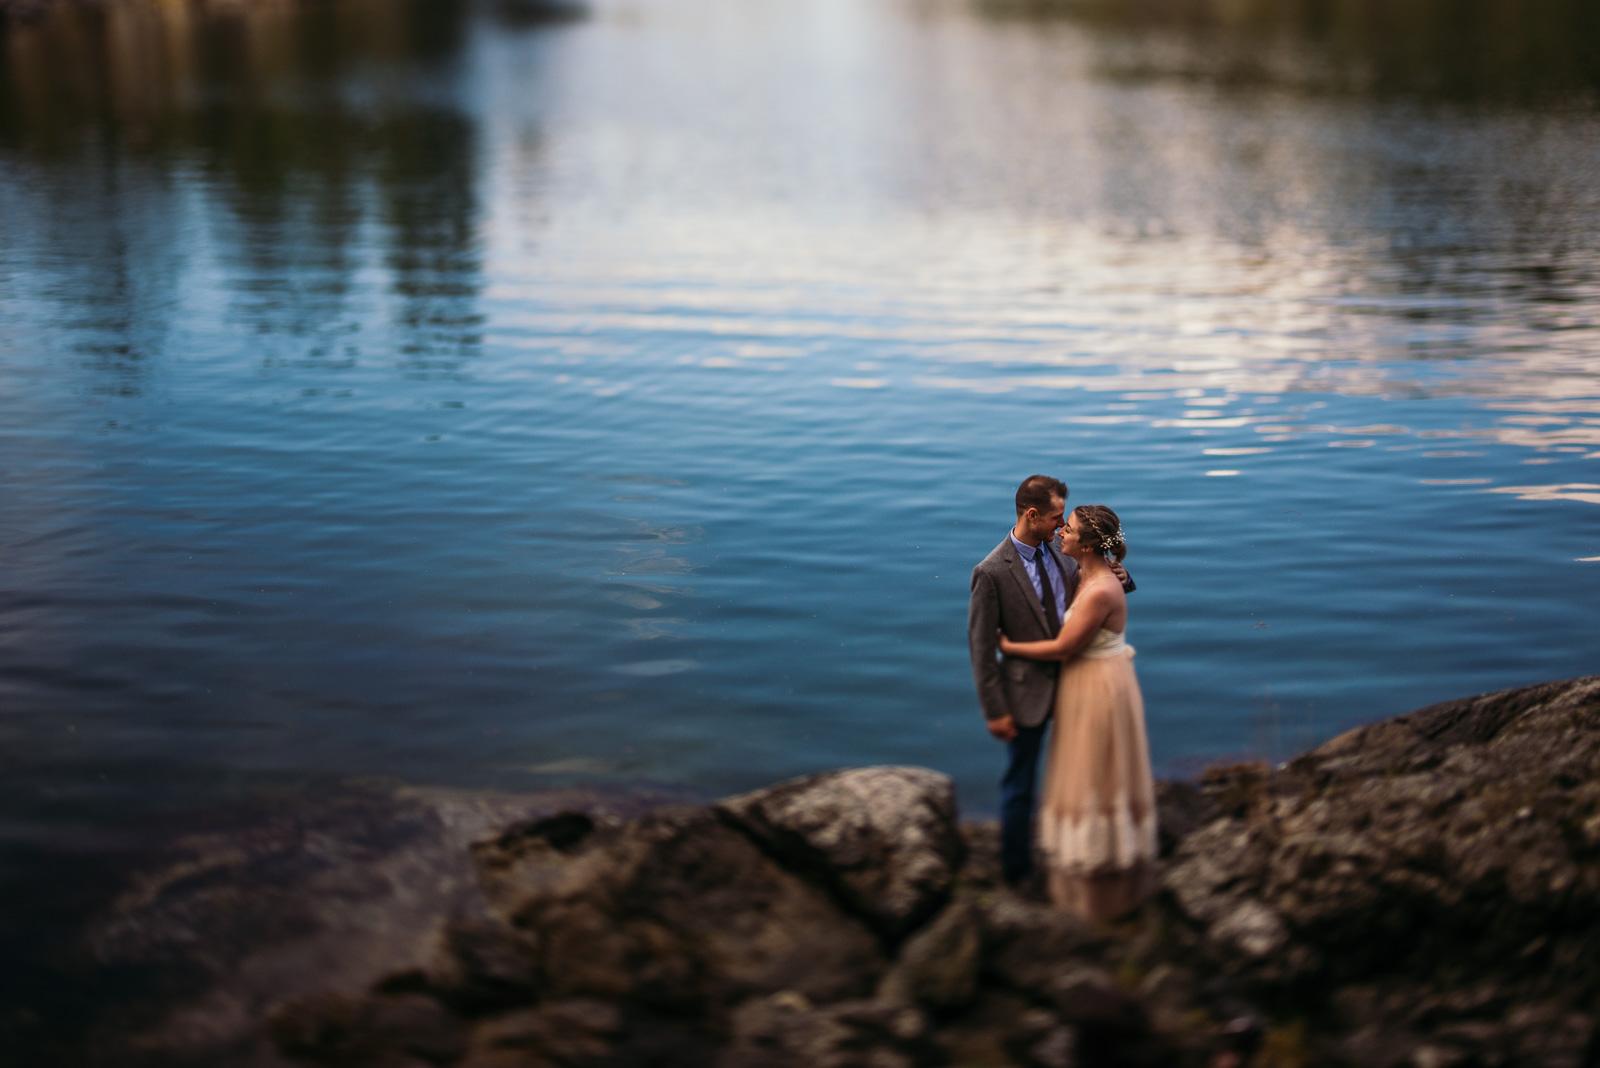 vancouver-island-wedding-photographers-cliff-gilker-park-smugglers-cove-elopement-33.jpg